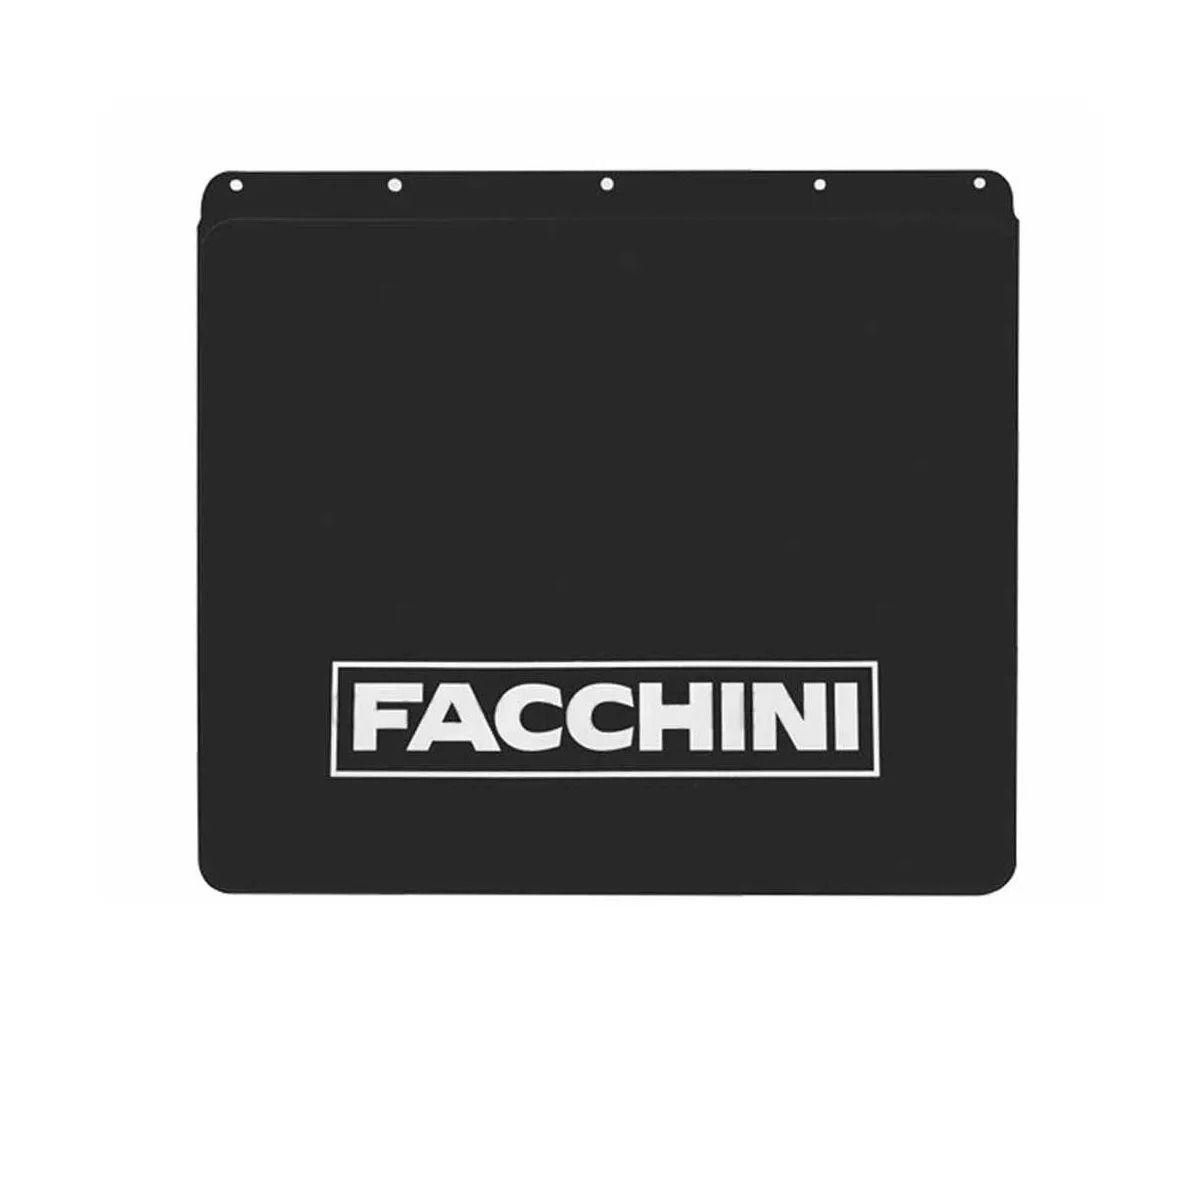 Apara Barro Borracha para Carreta Facchini (57,5x62)